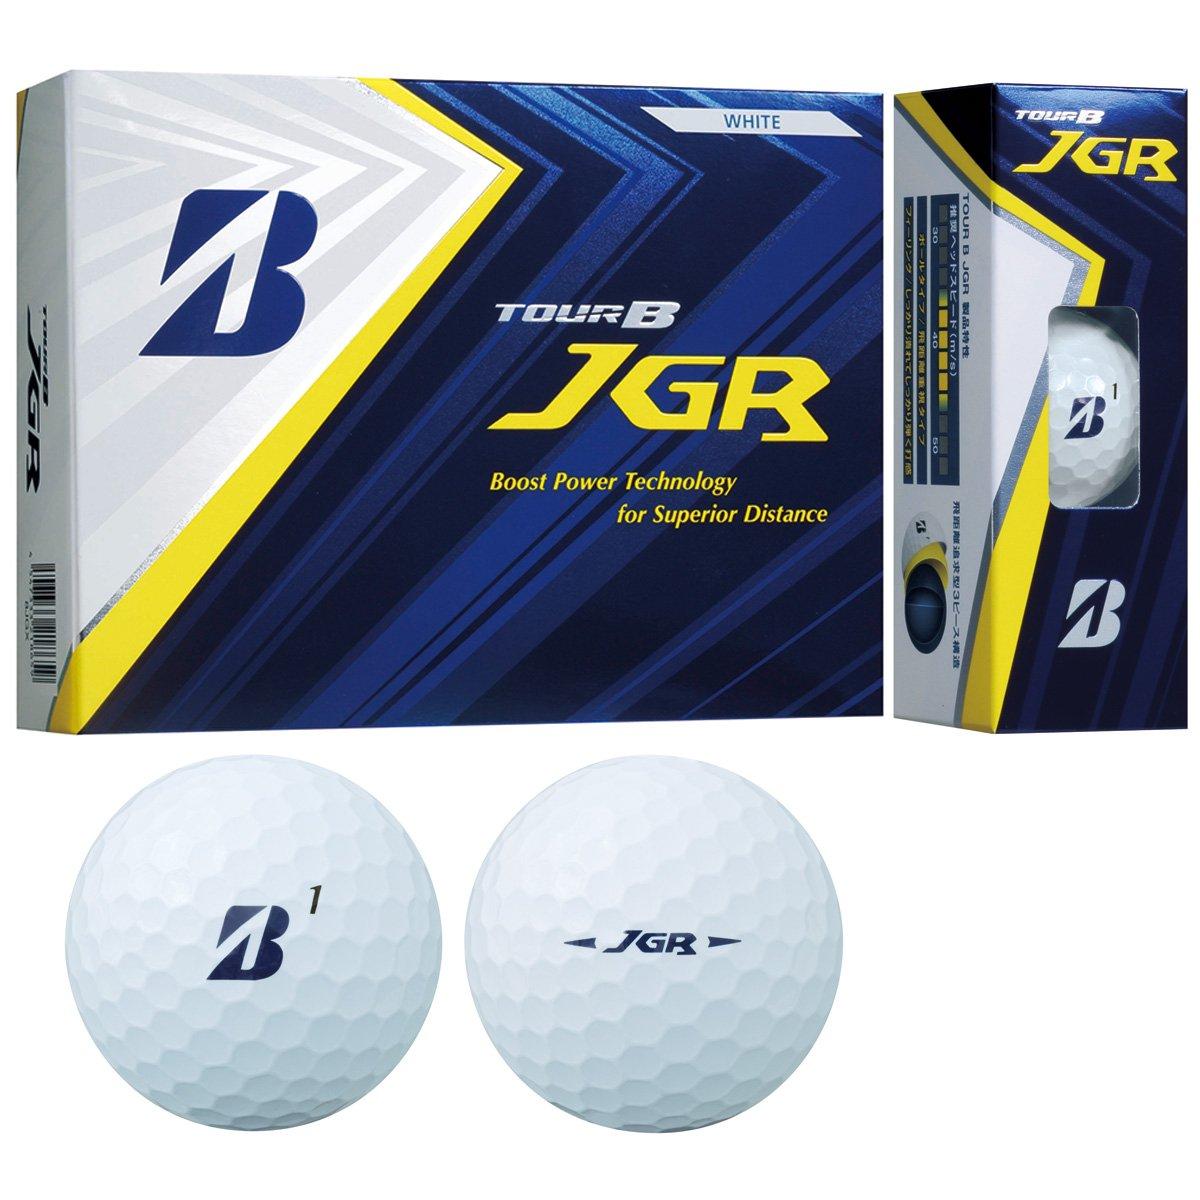 BRIDGESTONE TOUR B JGR WHITE 8JWX ブリヂストン ツアービー ジェイジーアール ホワイト 2ダースパック 24球 ボール ゴルフ 送料無料 平成最後 令和 新生活